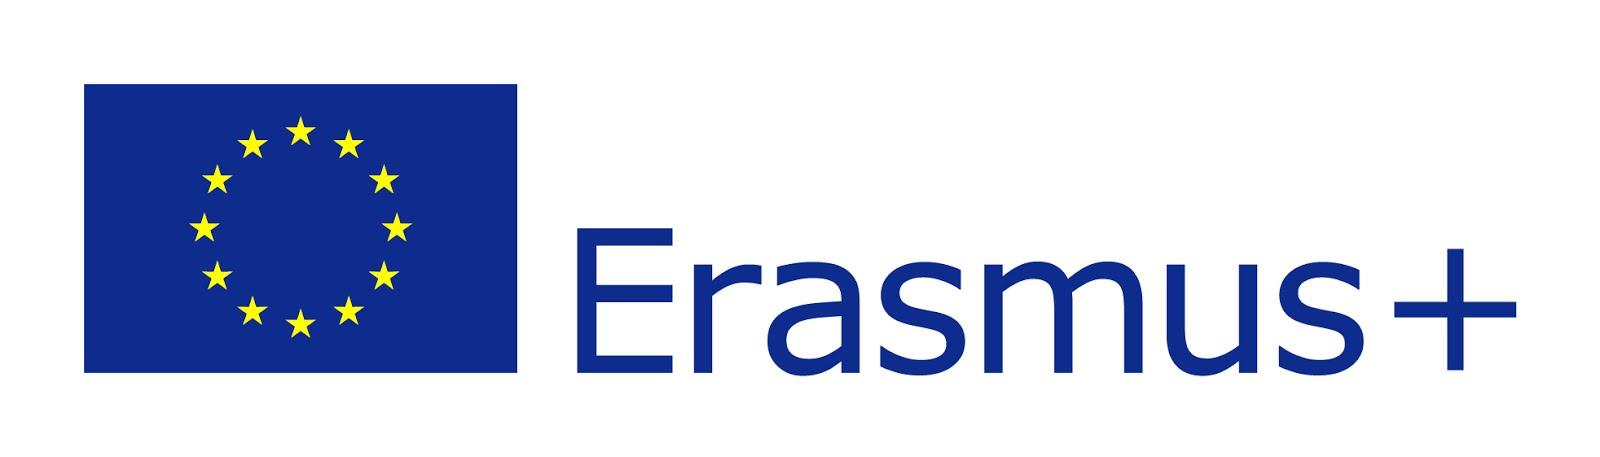 Erasmus+ ja Euroopa Liidu  logo